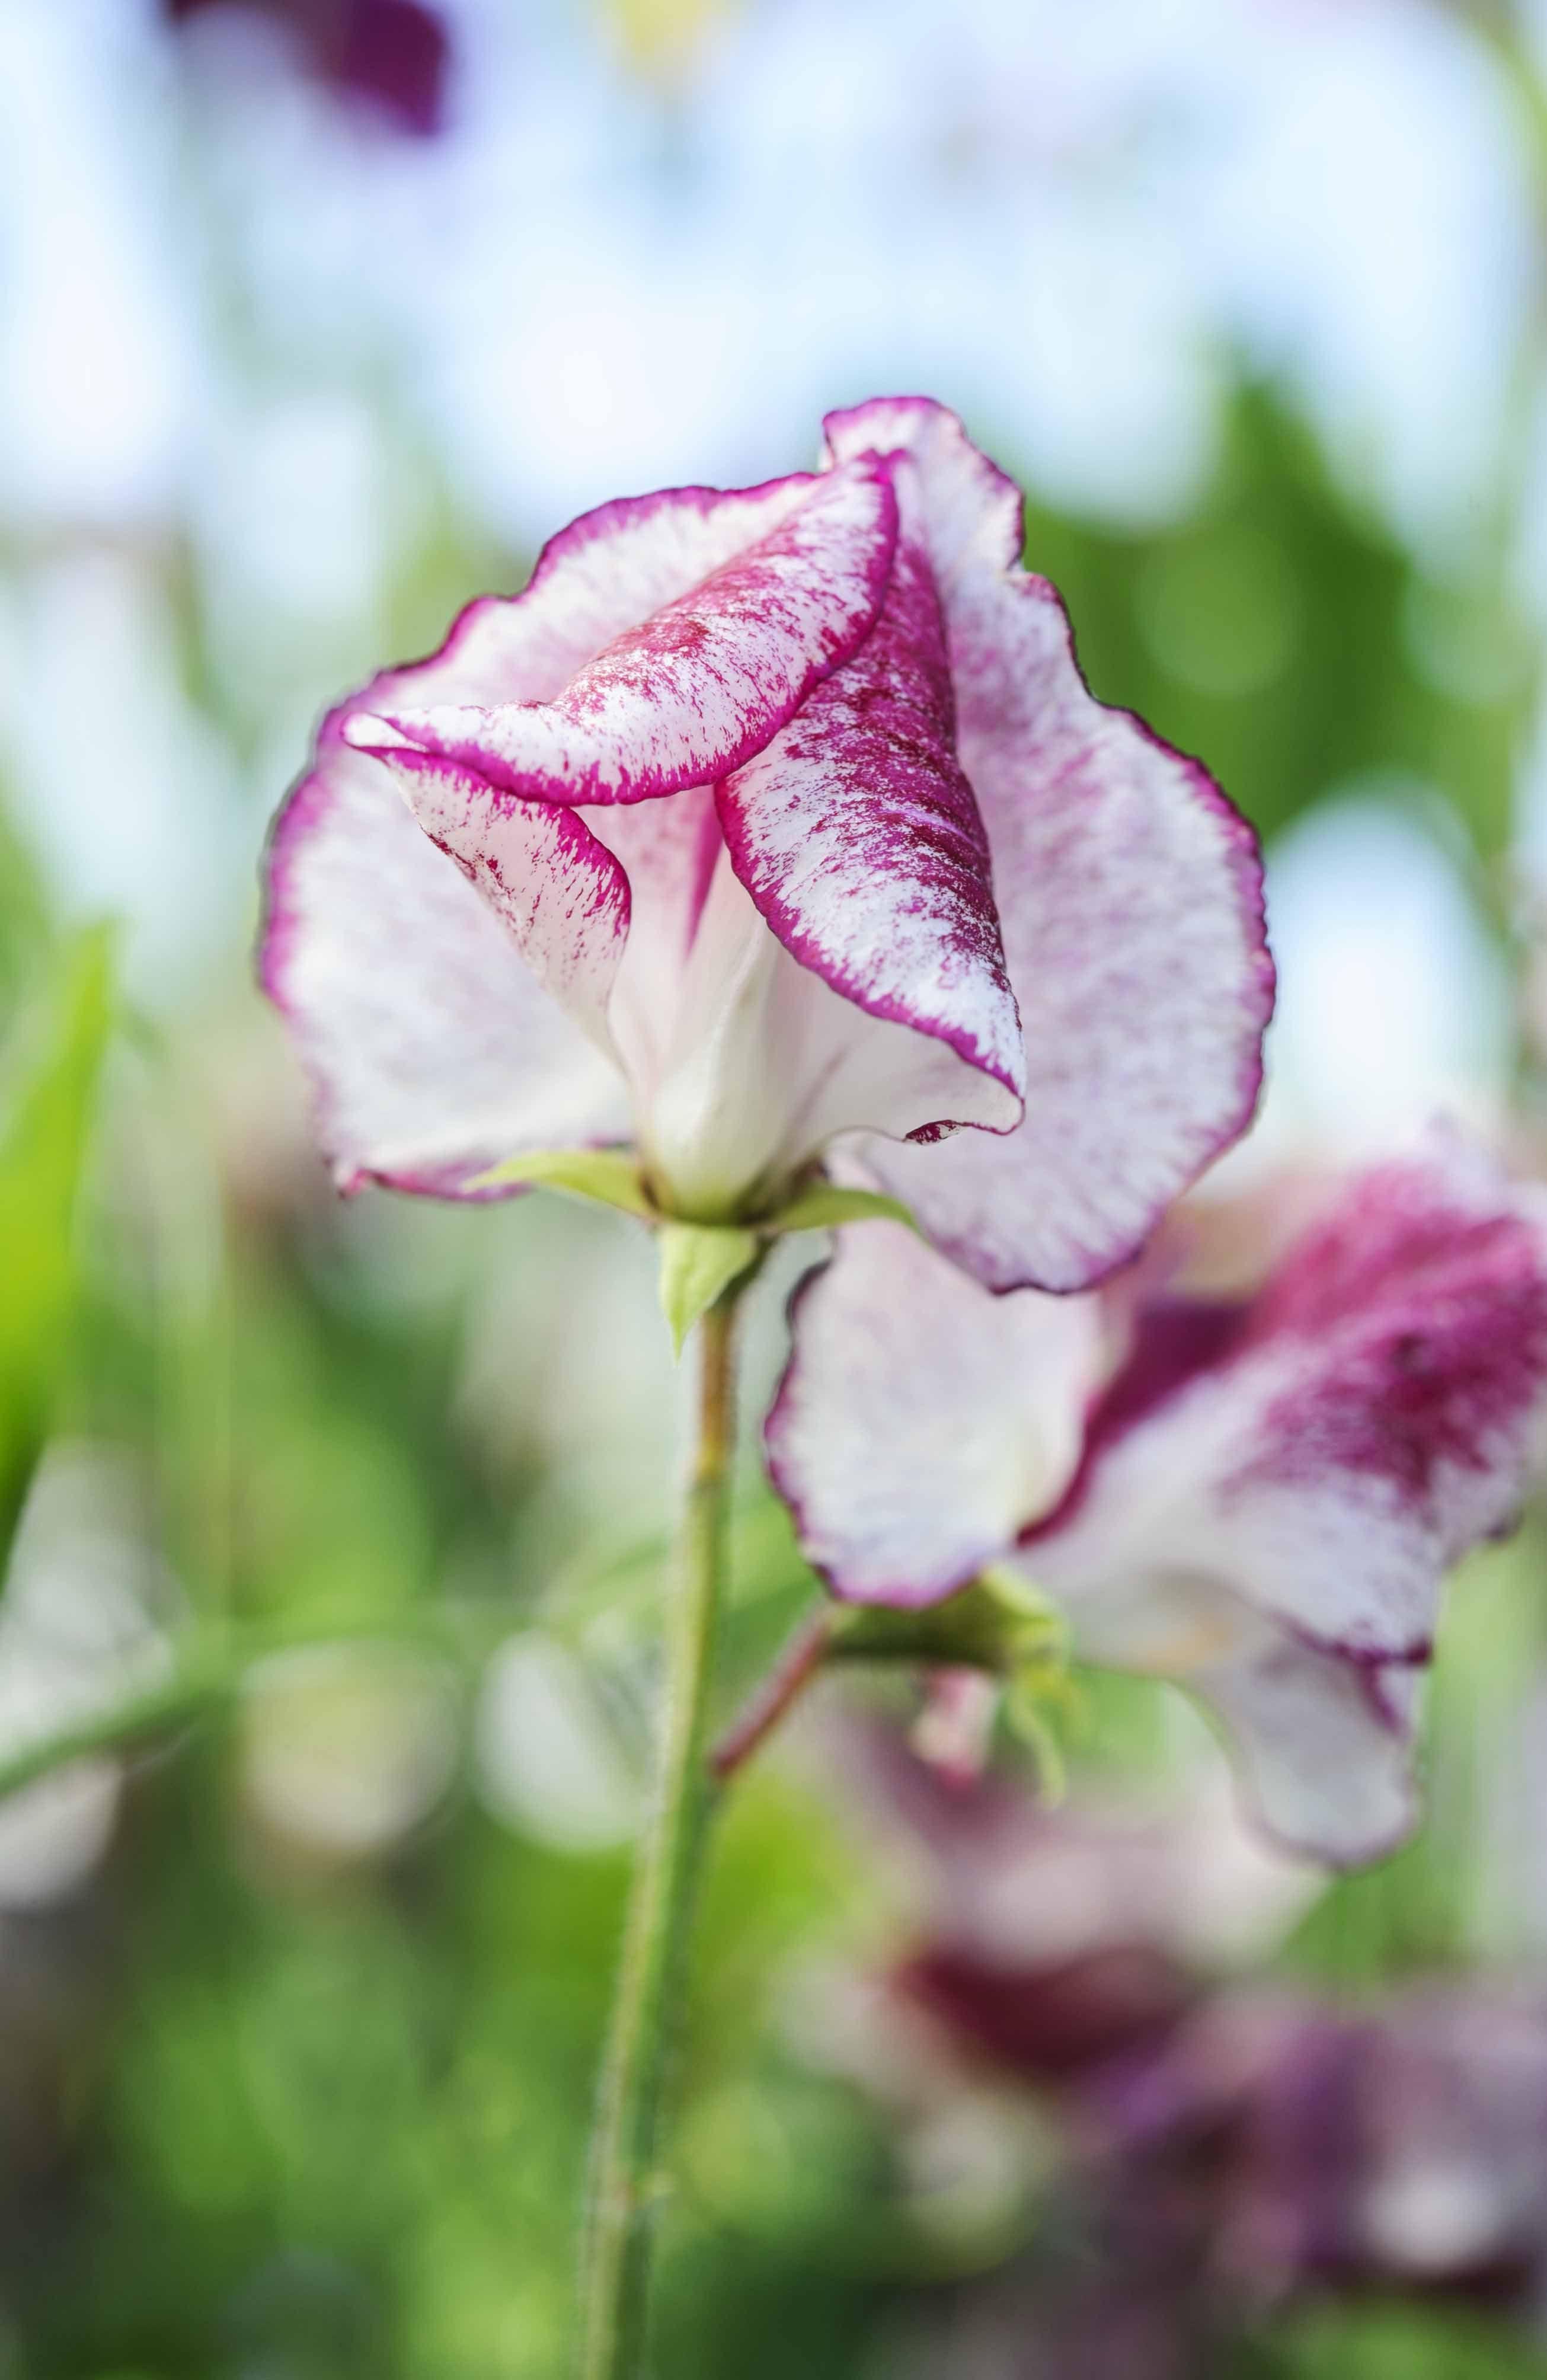 Lathyrus odoratus Wiltshire Ripple sweet pea